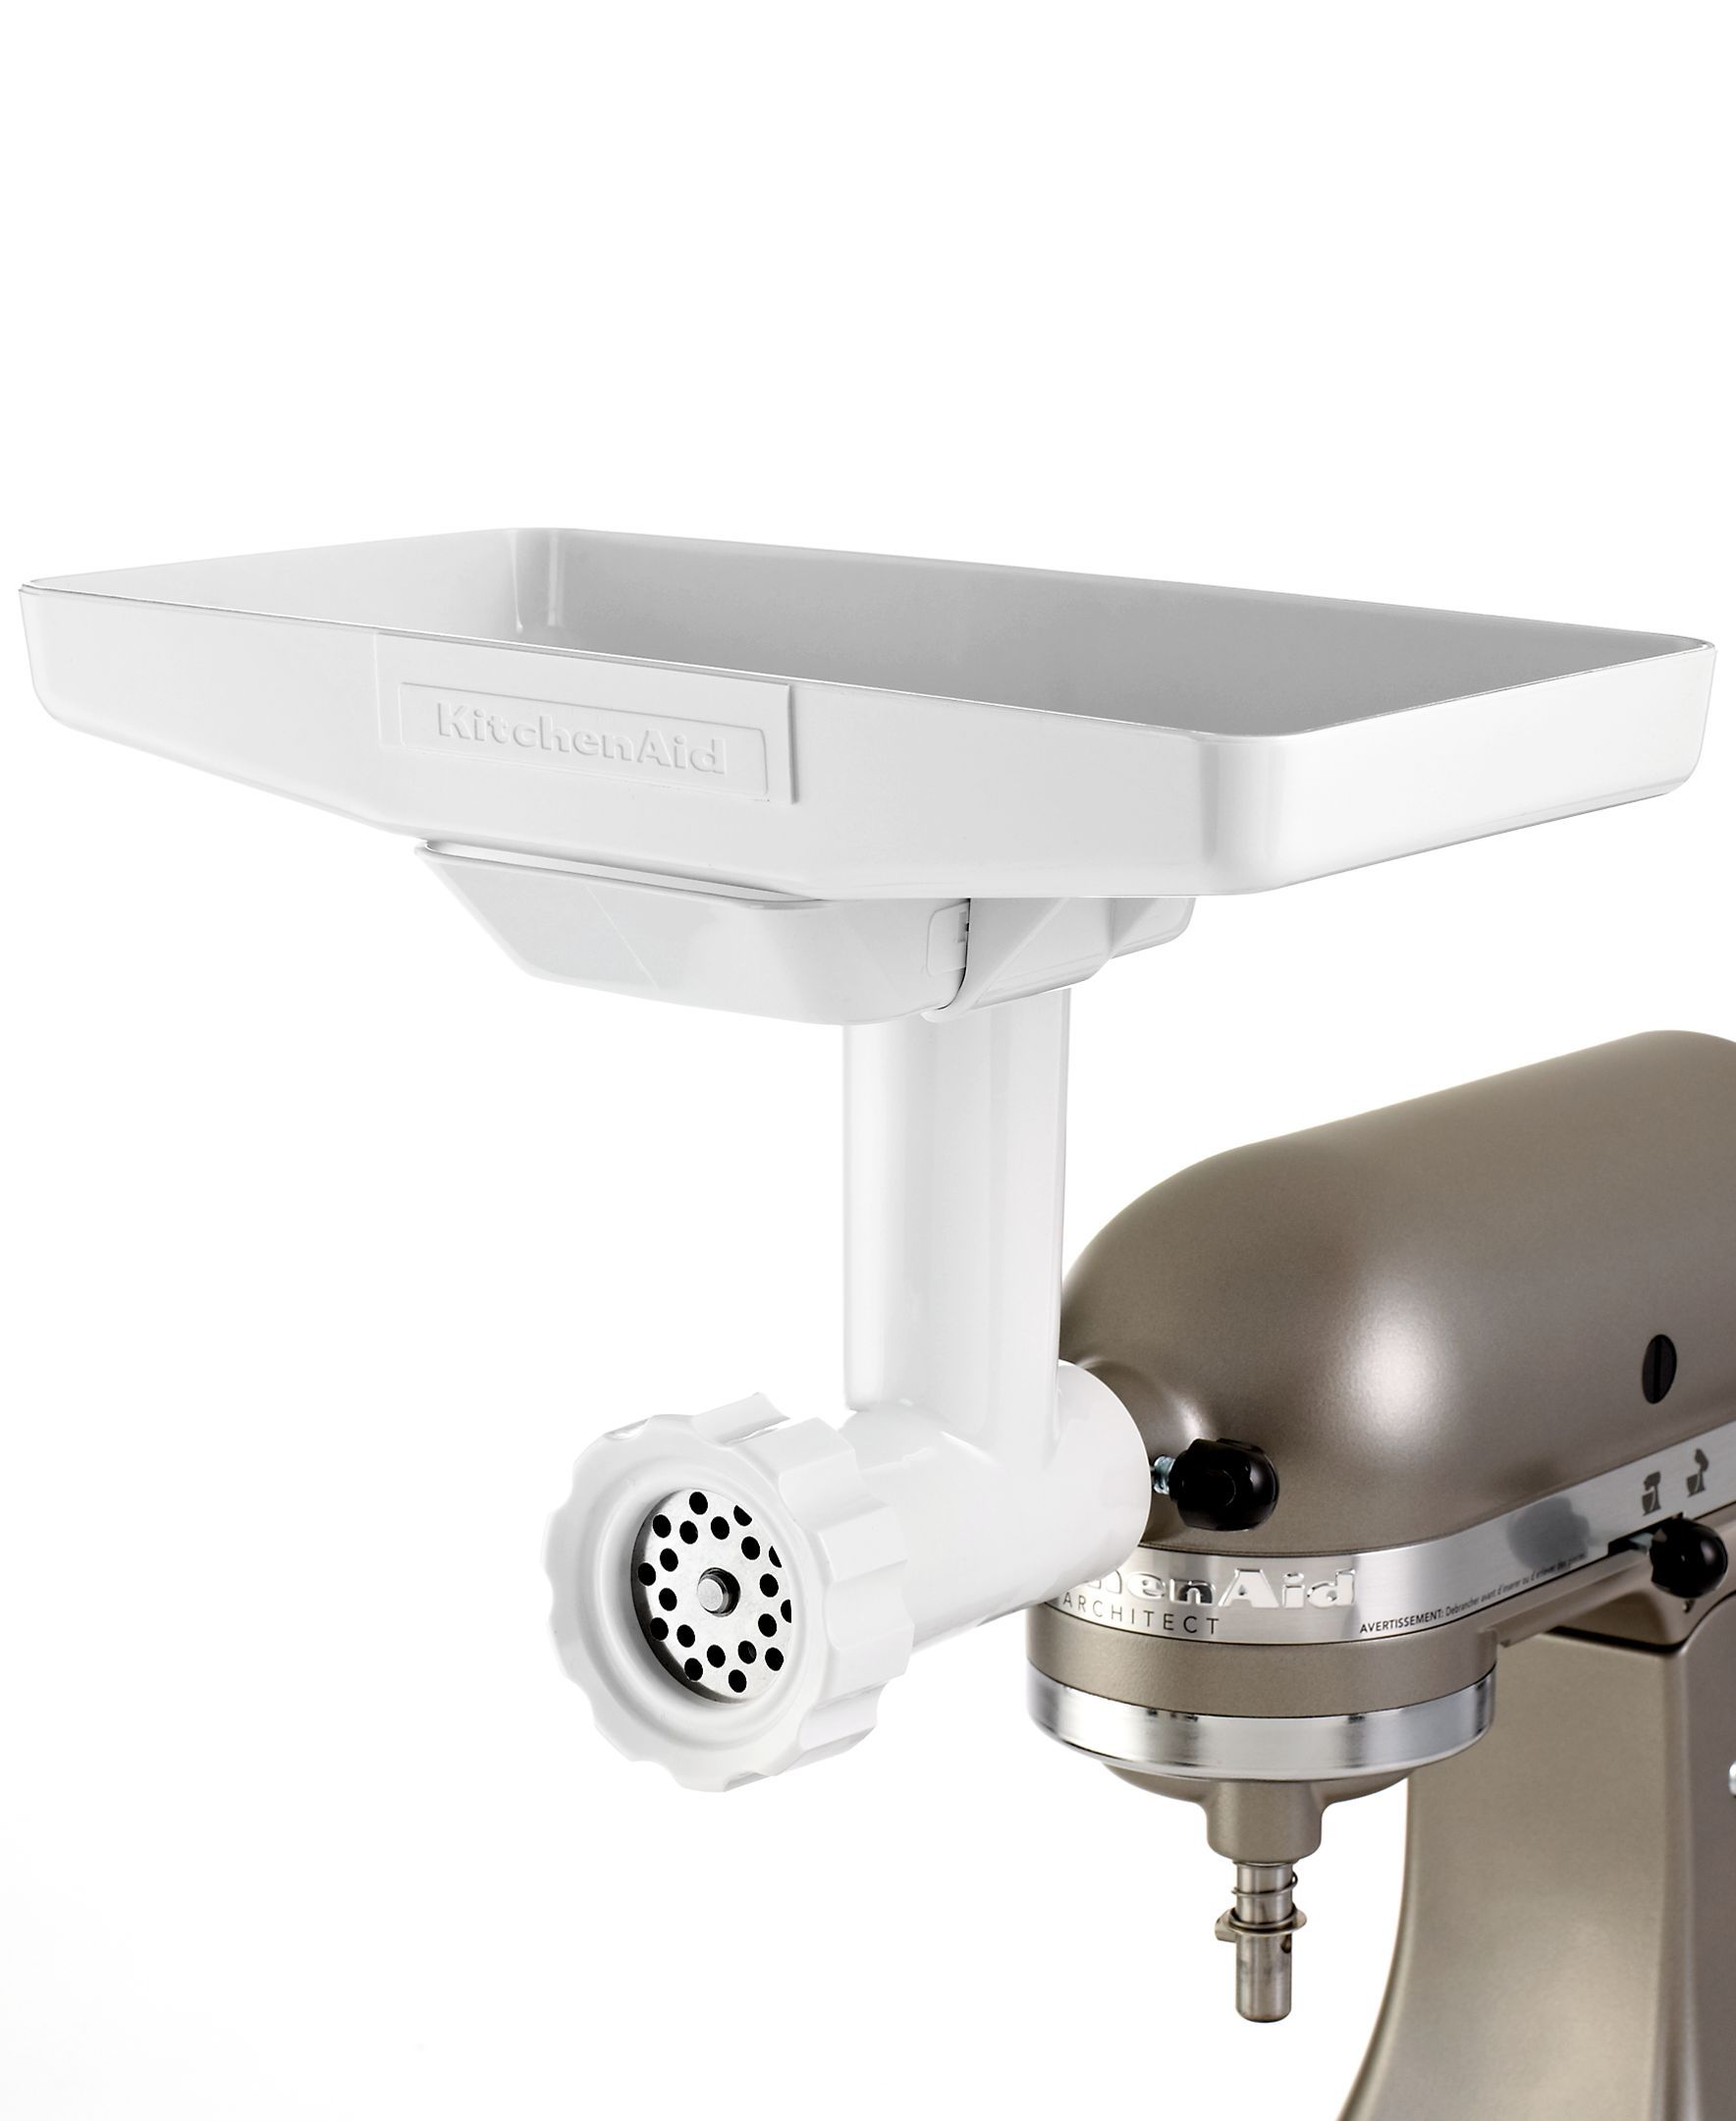 Kitchenaid ft food tray stand mixer attachment kitchen